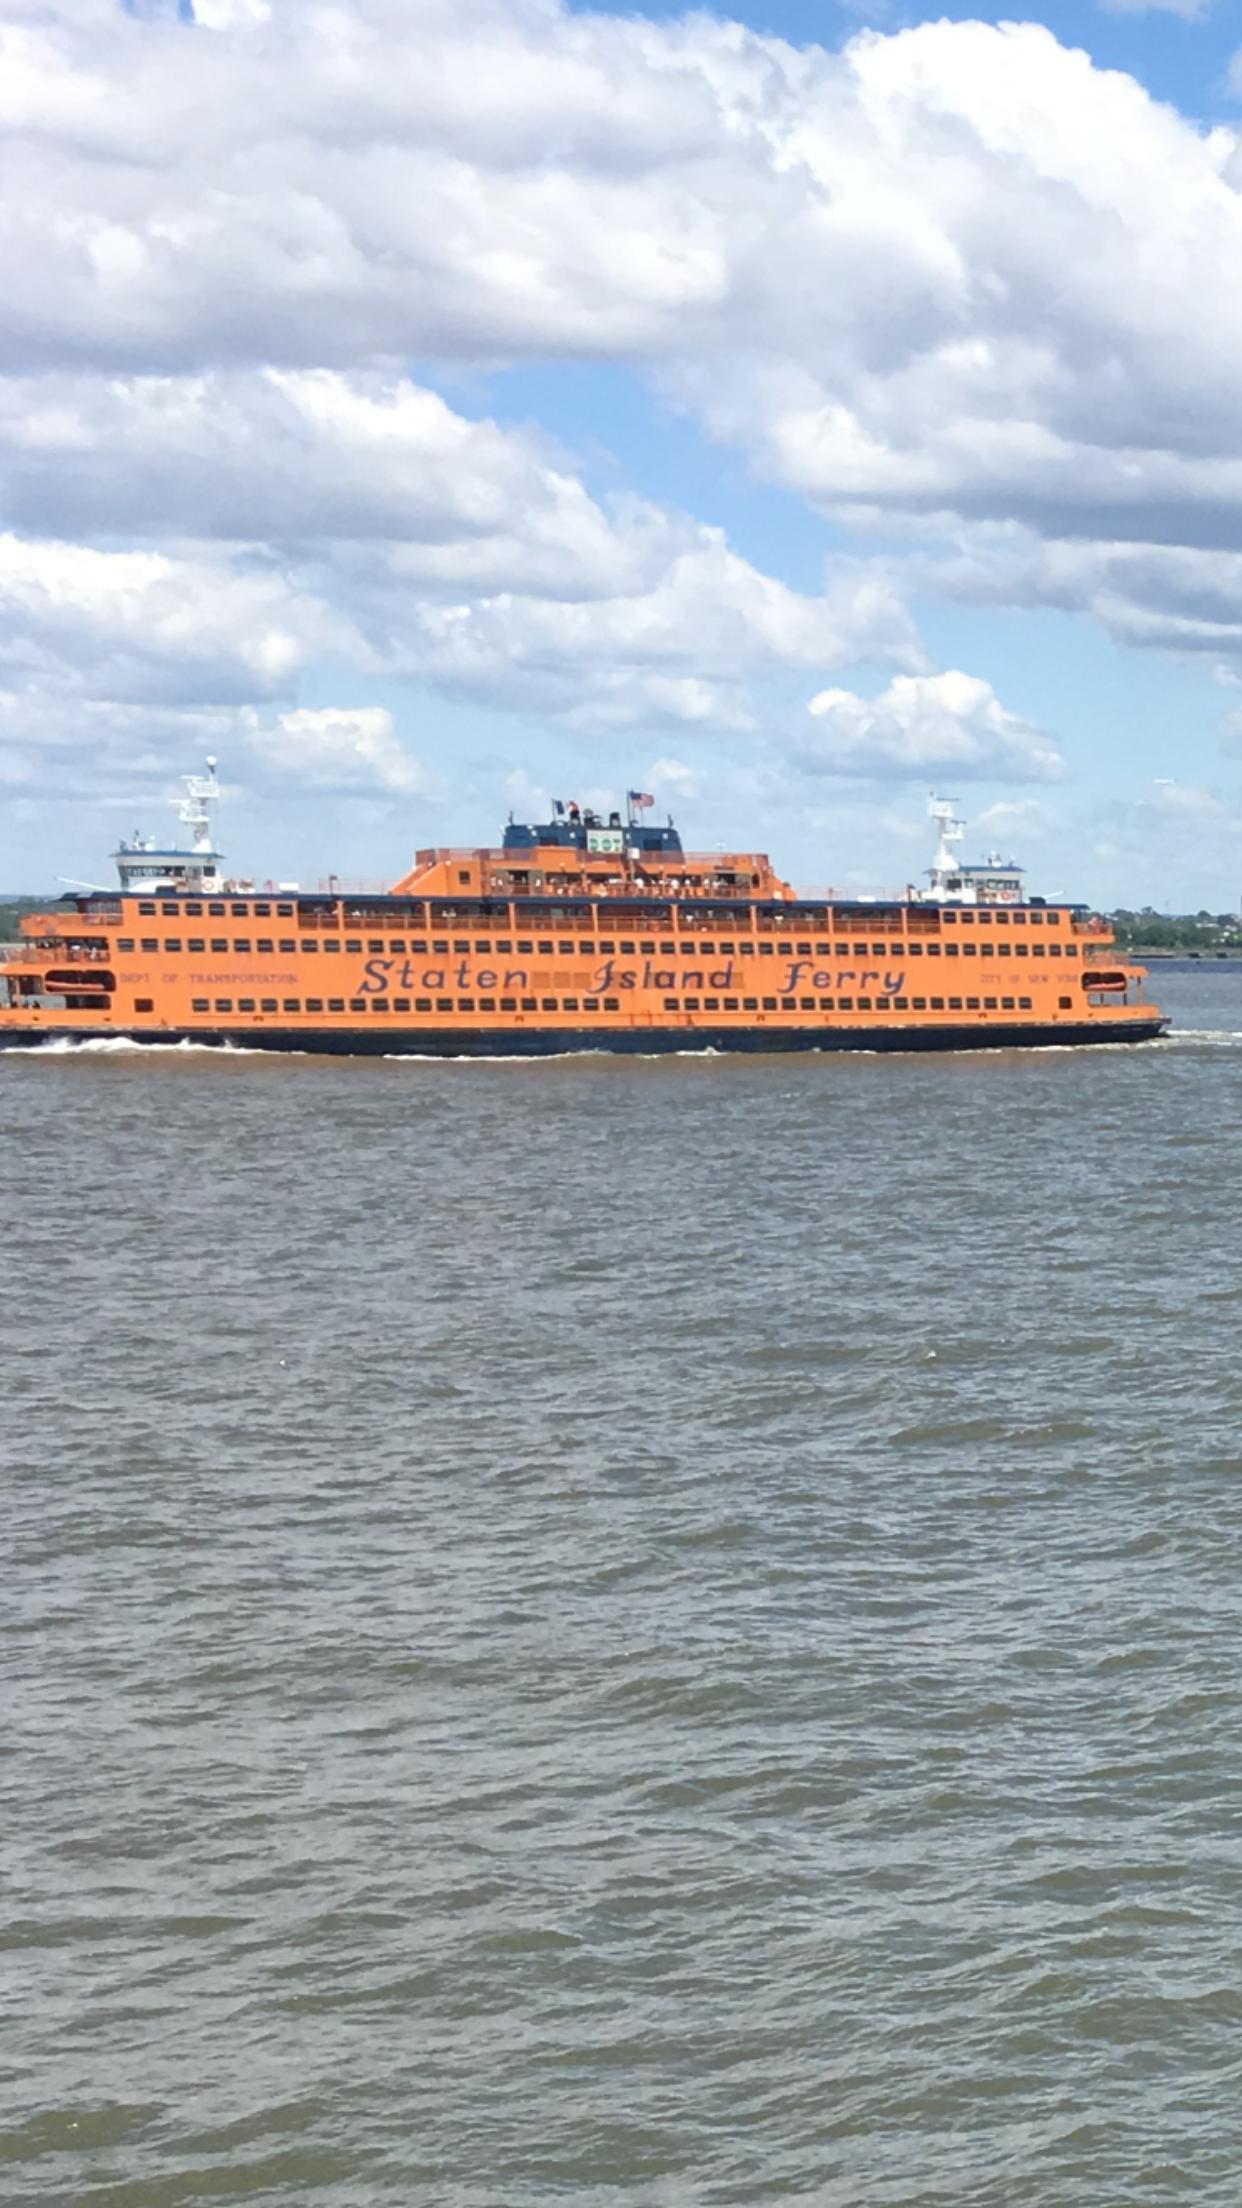 Staten Island Ferry ⛴